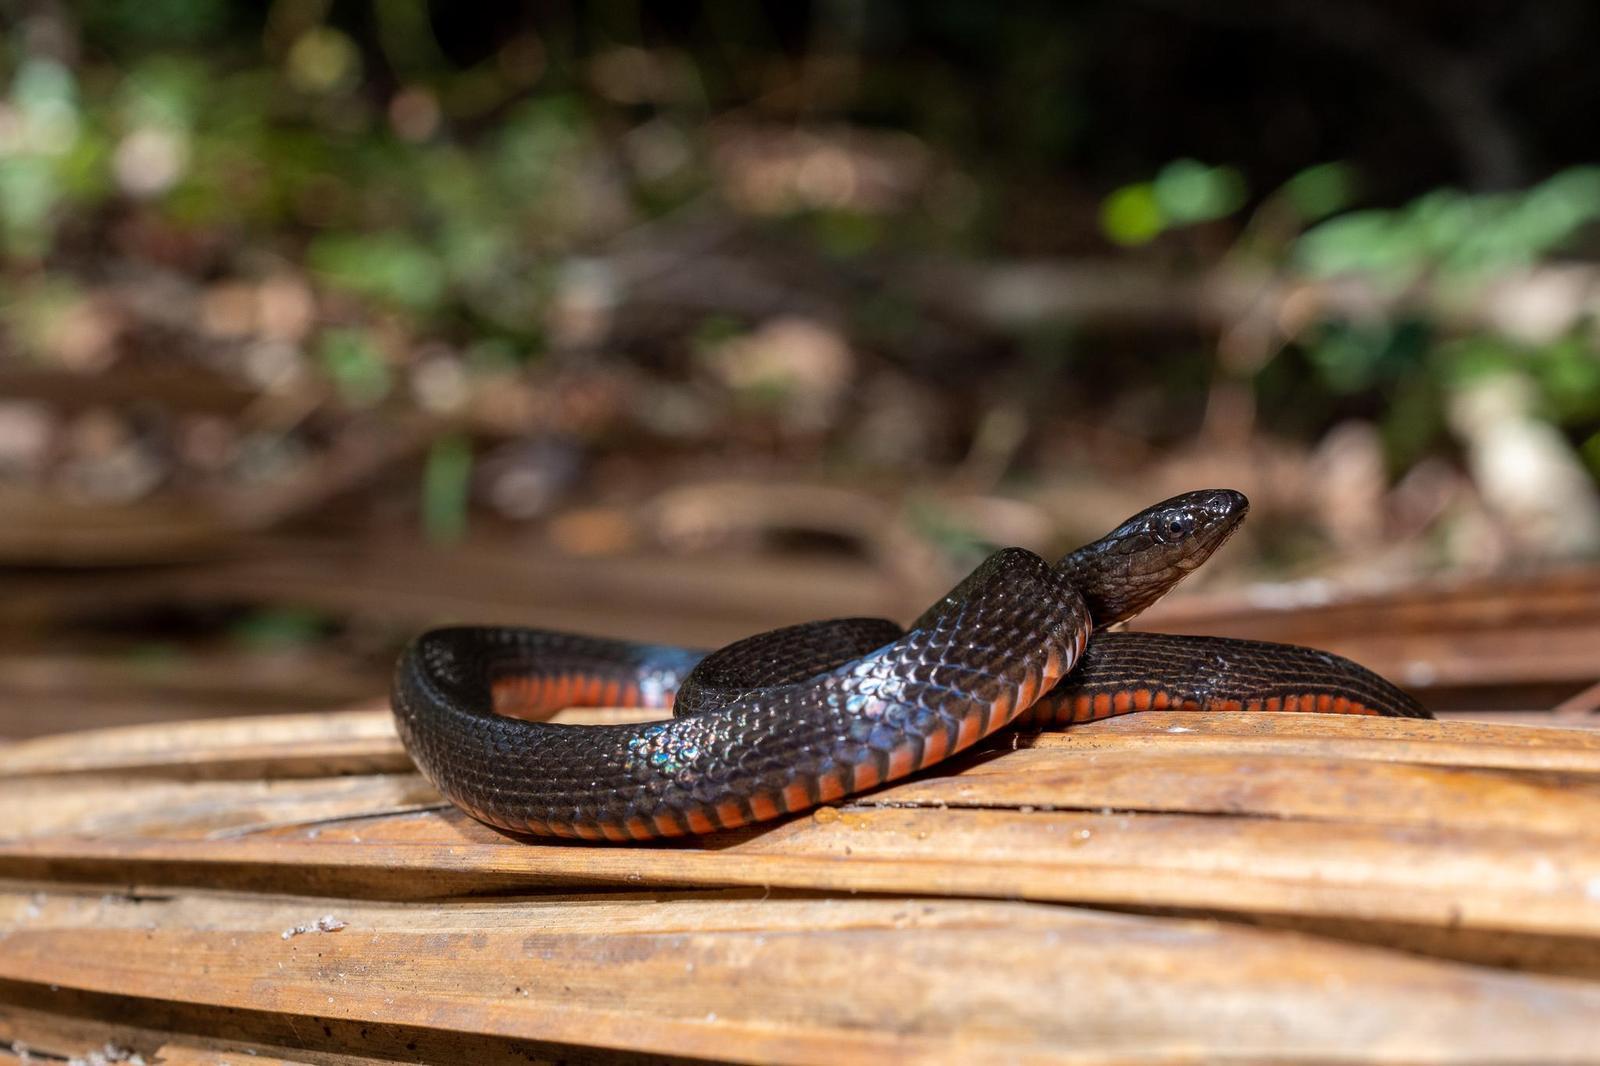 Black Swamp Snake Photo by Jacob Zadik